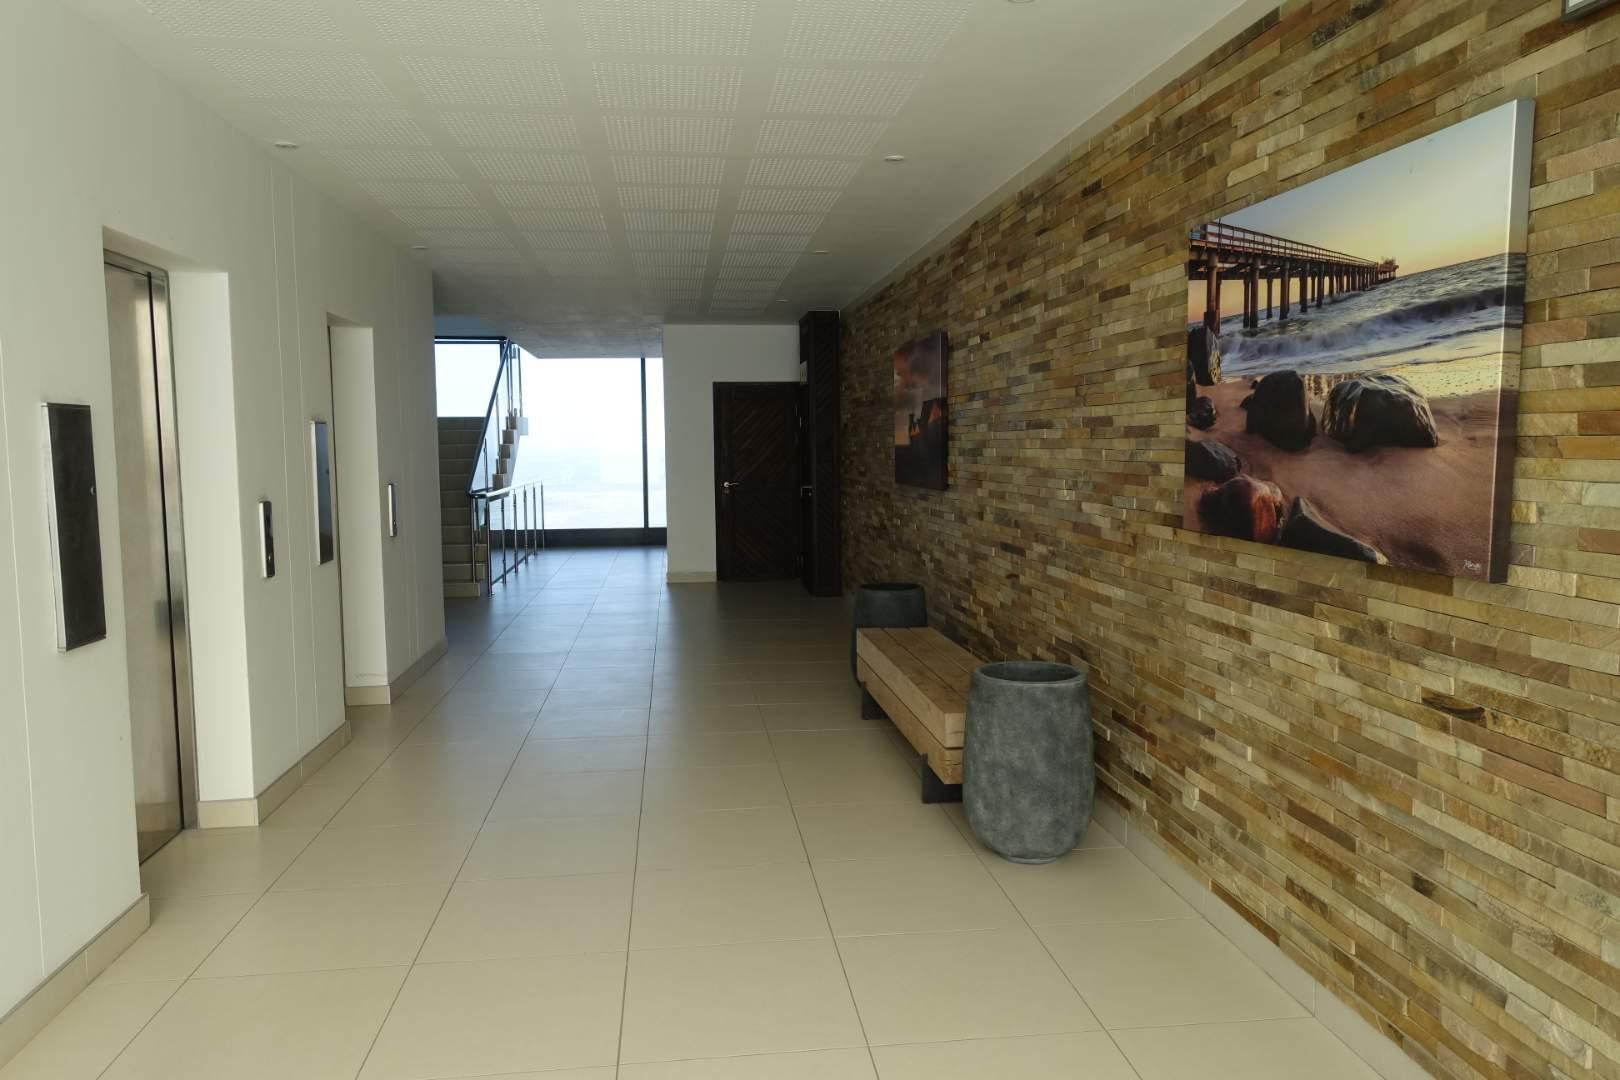 Passage with elevators